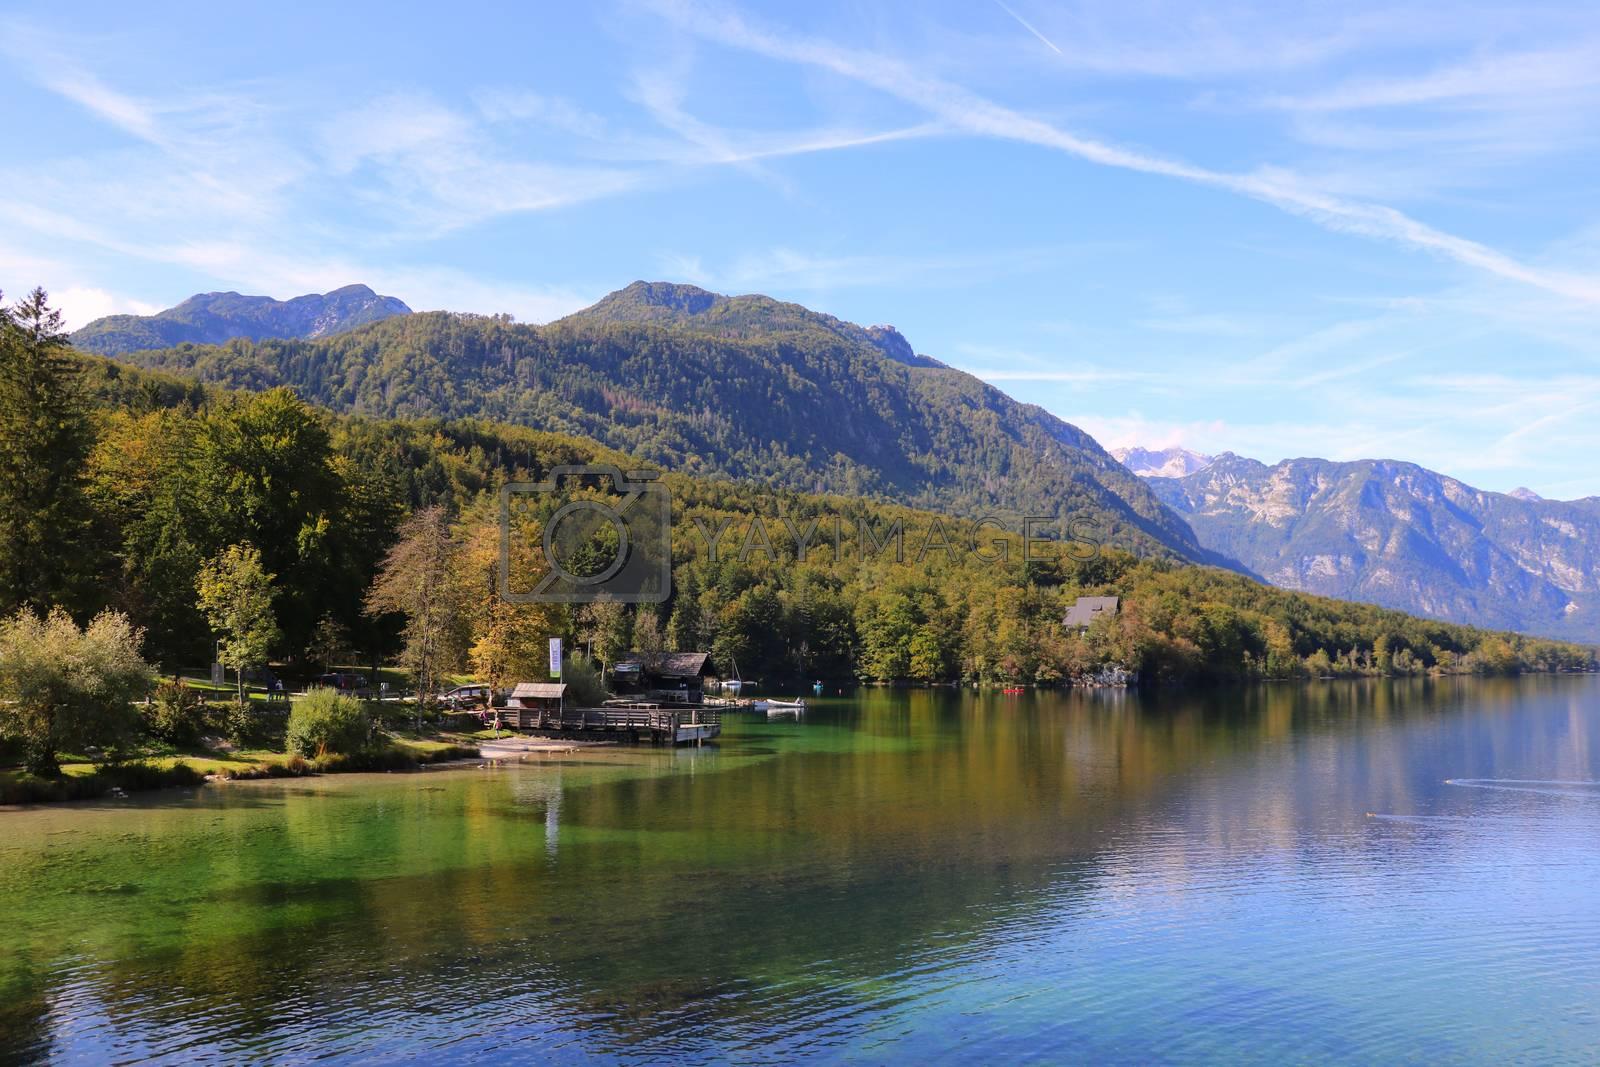 Bohinj lake shore with mountain views in Slovenia. by kip02kas